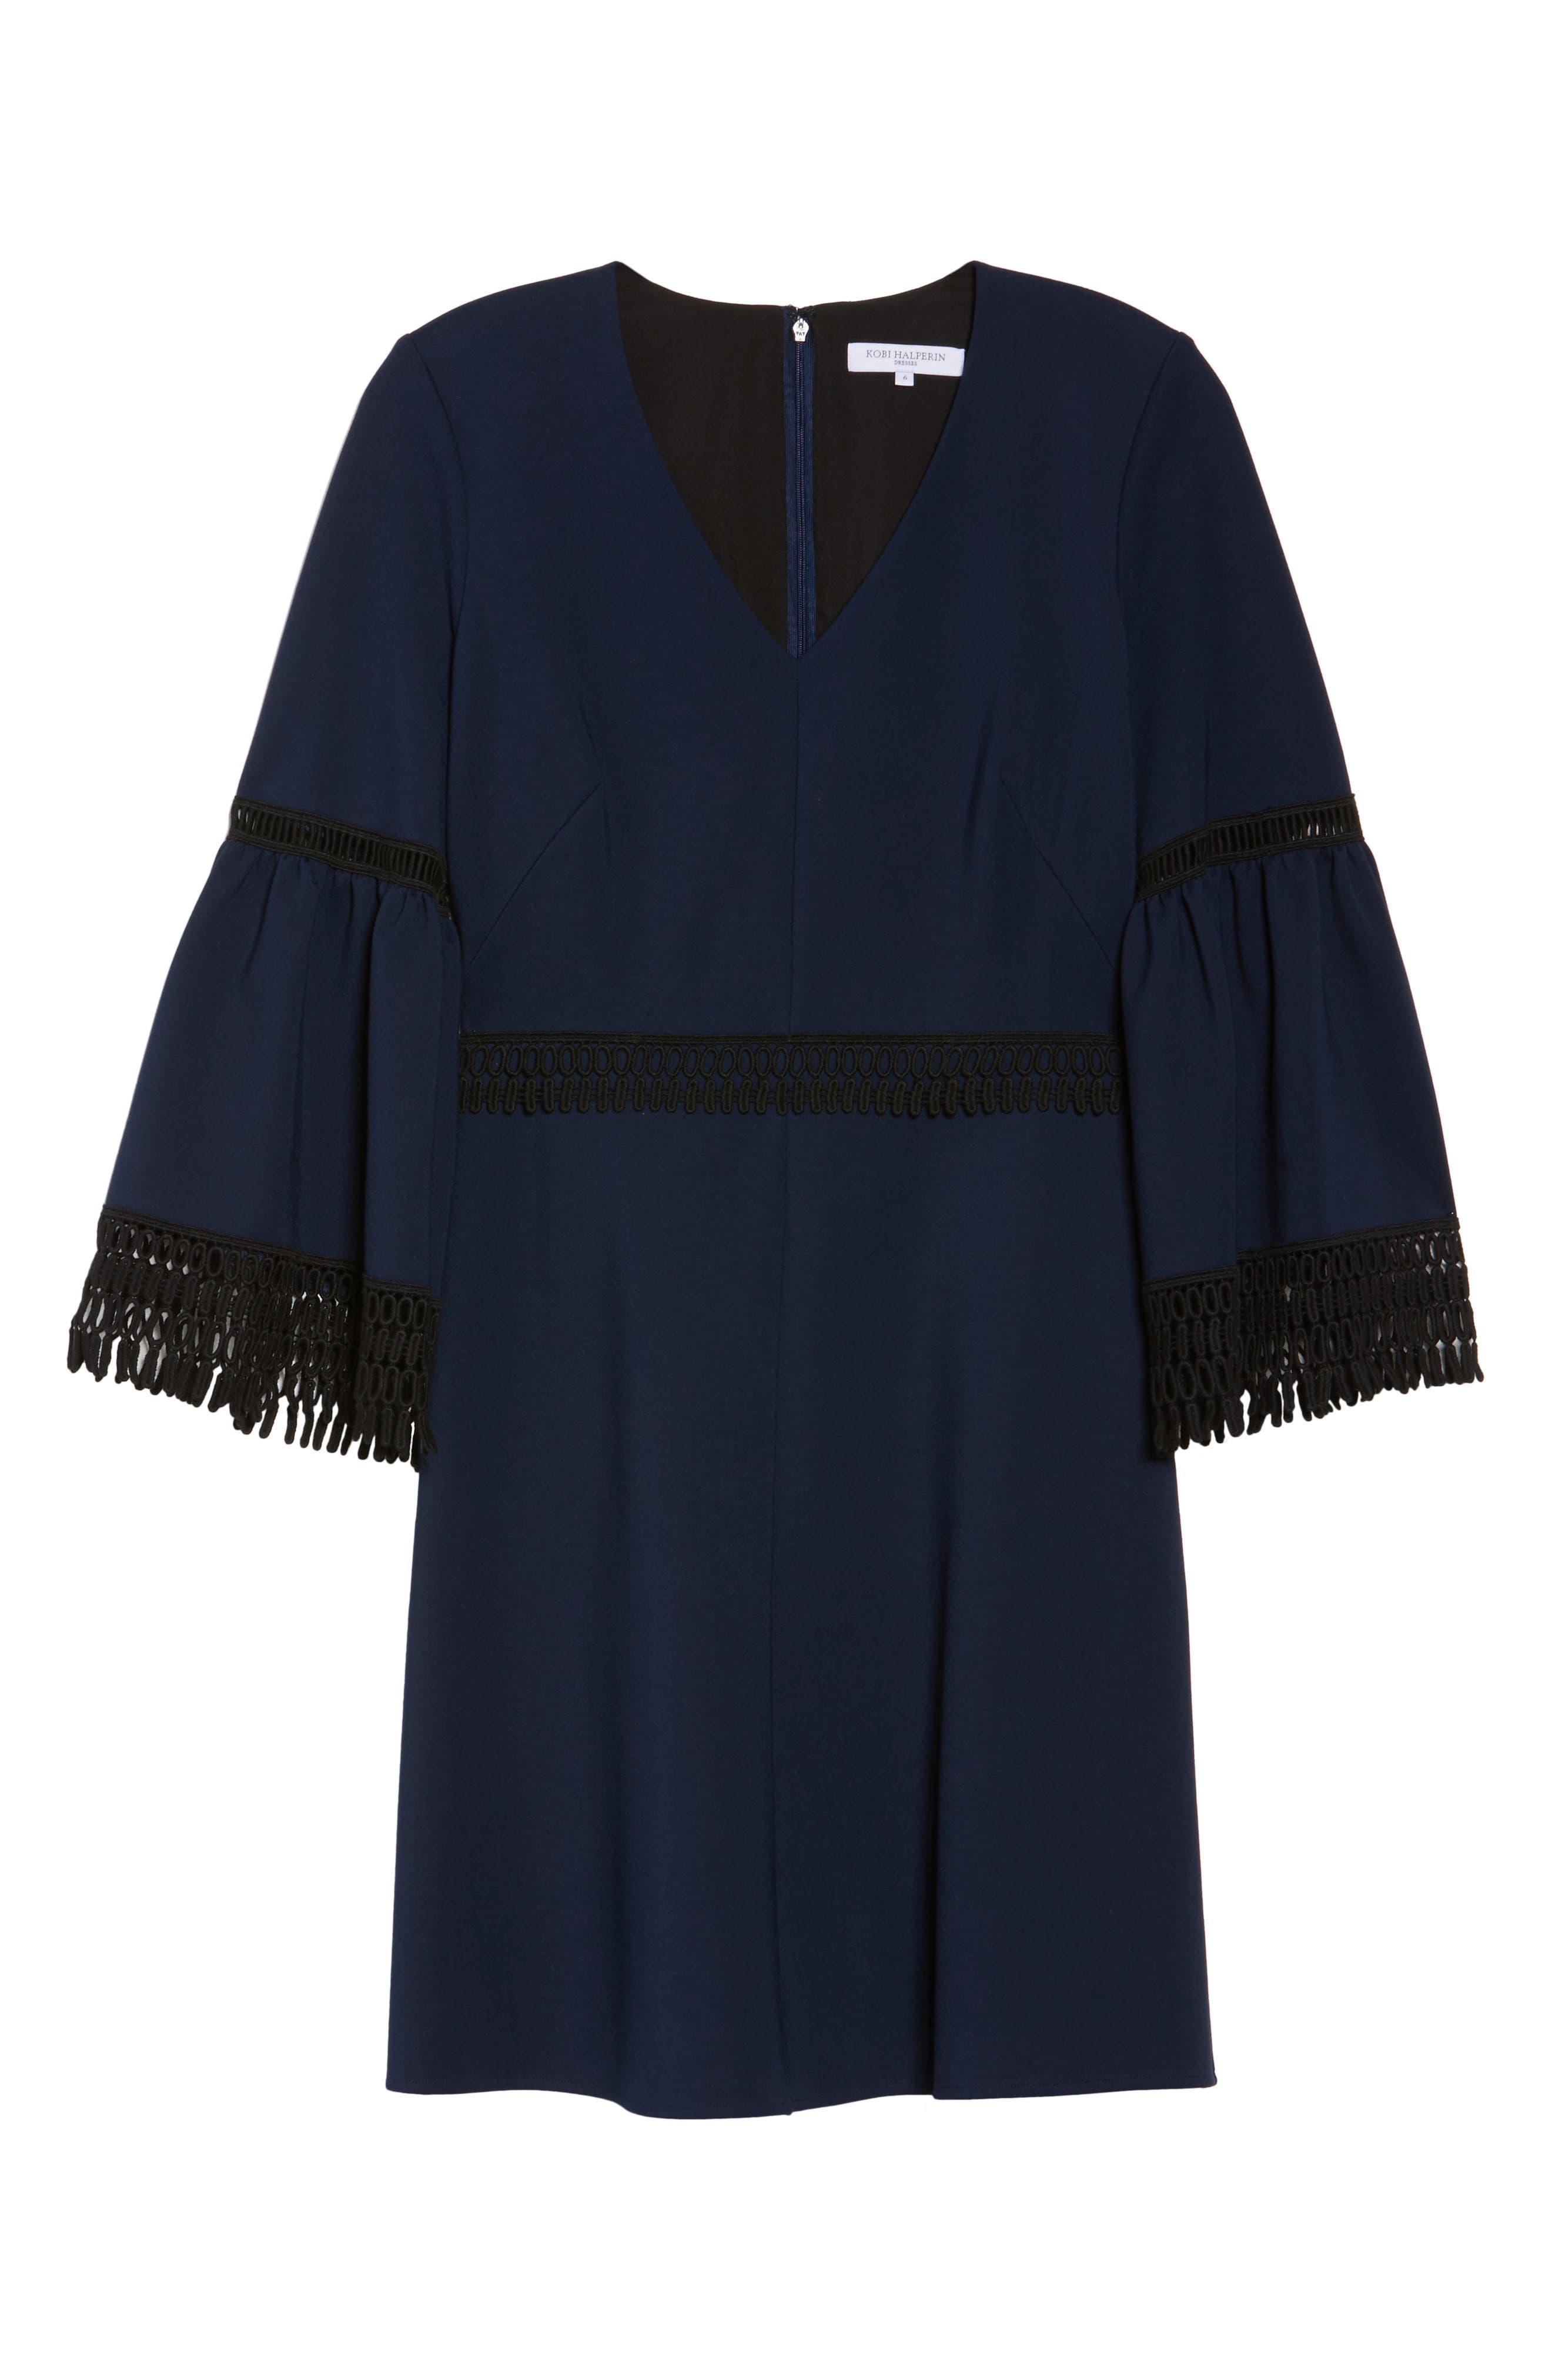 Vanessa Bell Sleeve Dress,                             Main thumbnail 1, color,                             Midnight Blue/ Black